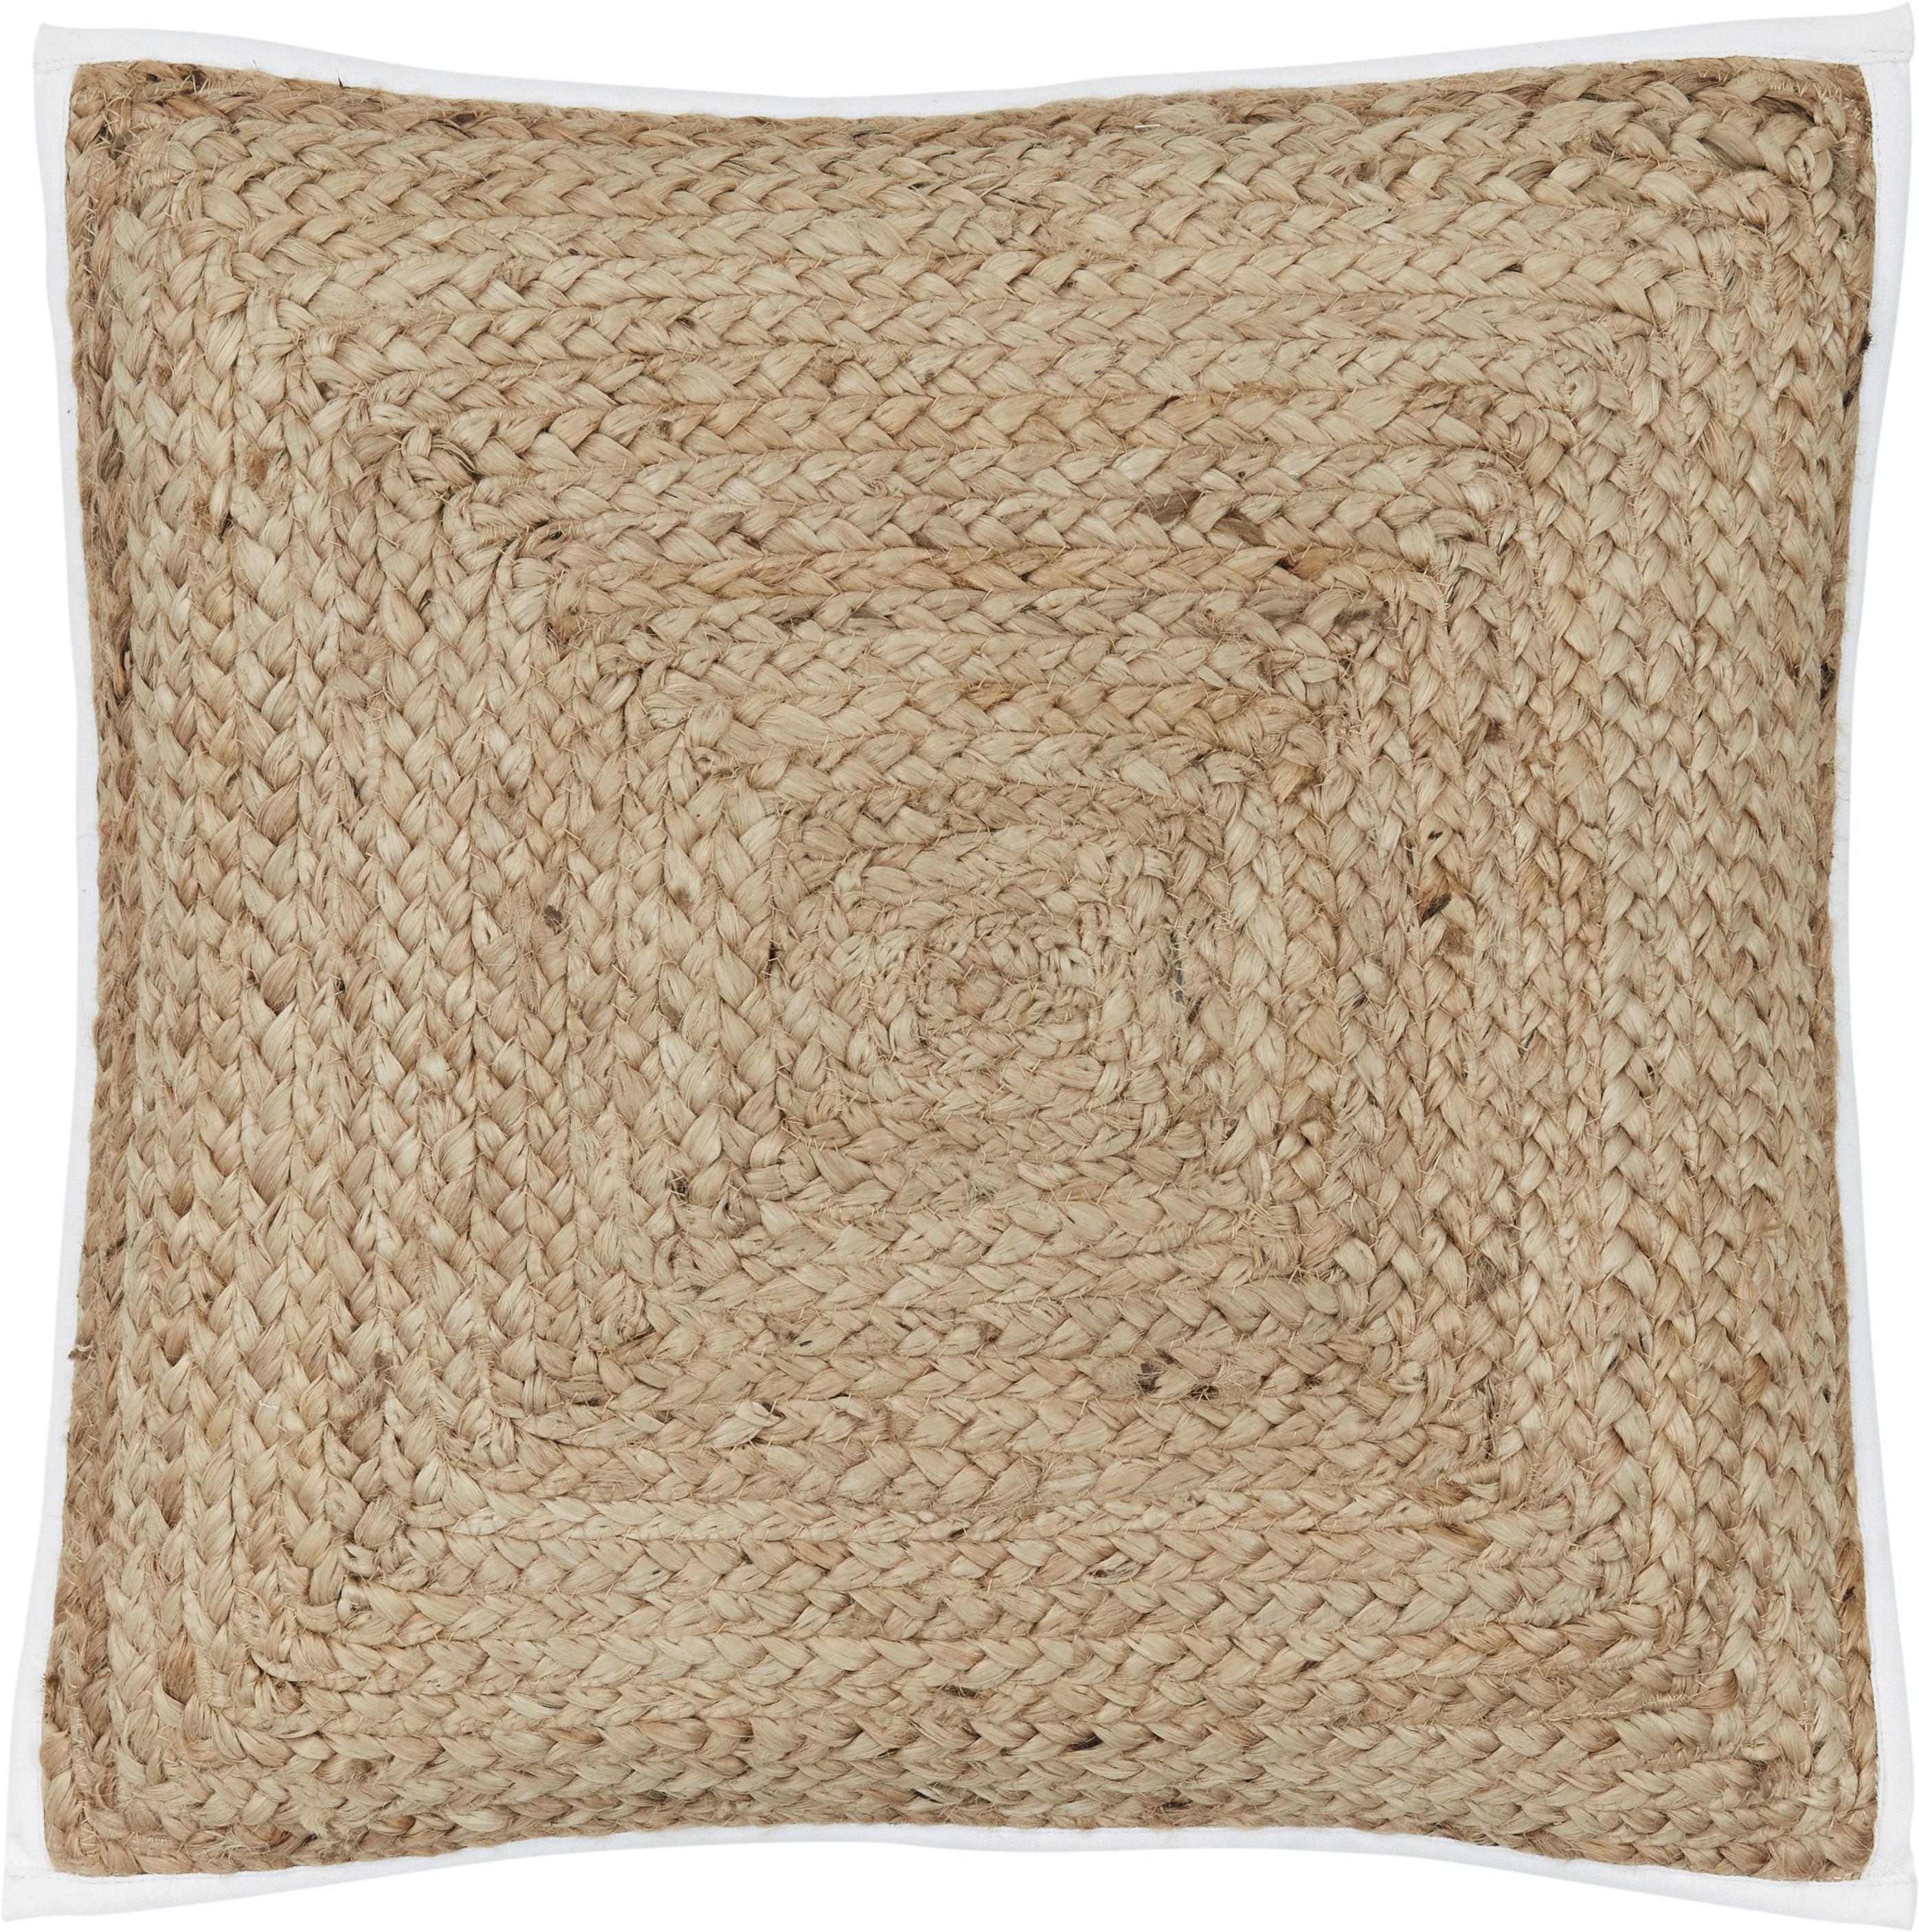 Federa arredo in juta Justina, Retro: cotone, Beige, bianco, Larg. 45 x Lung. 45 cm